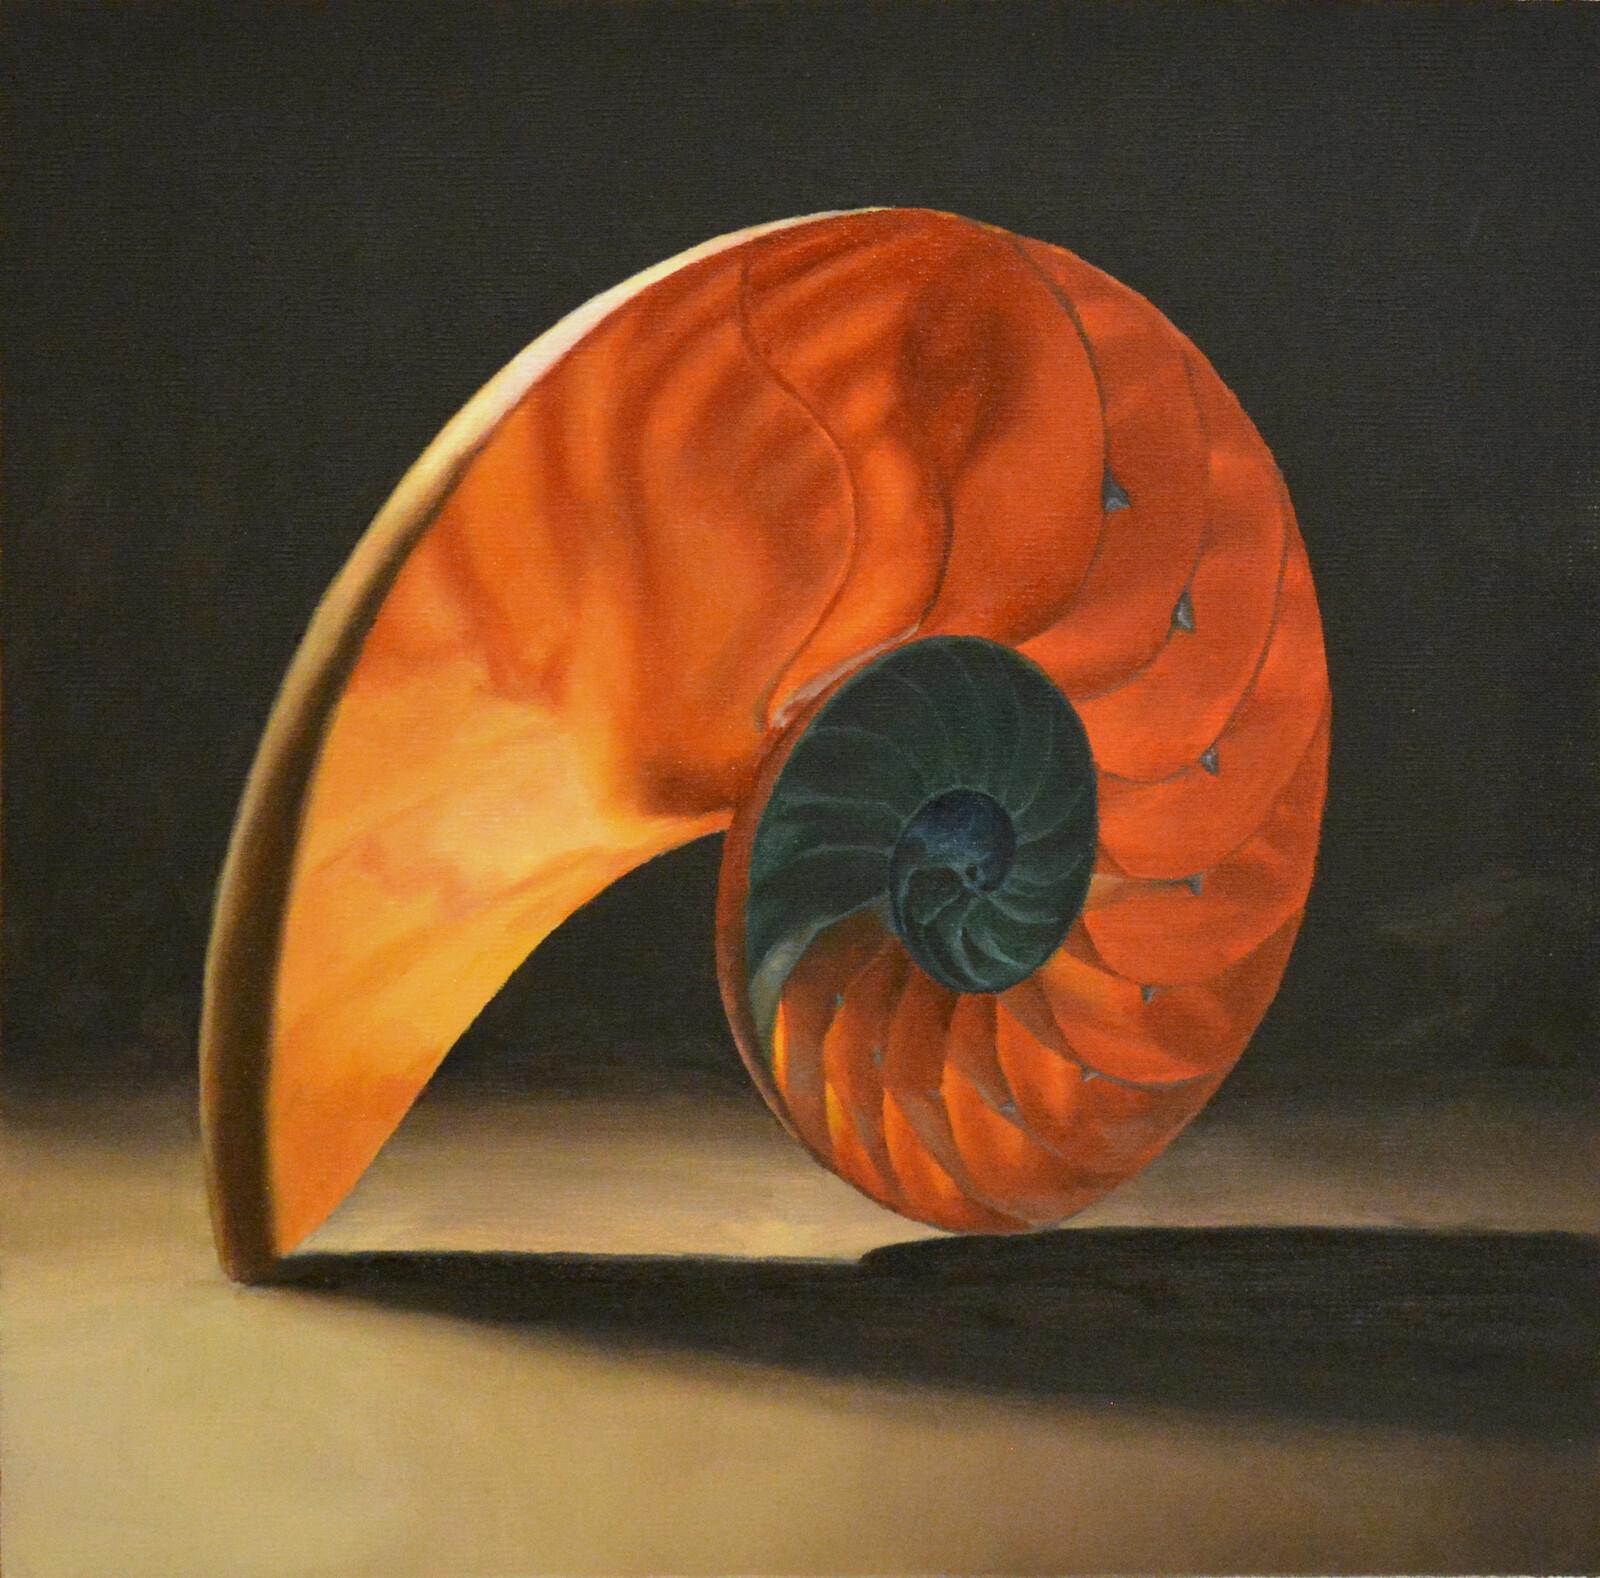 Oil Painting Study v3